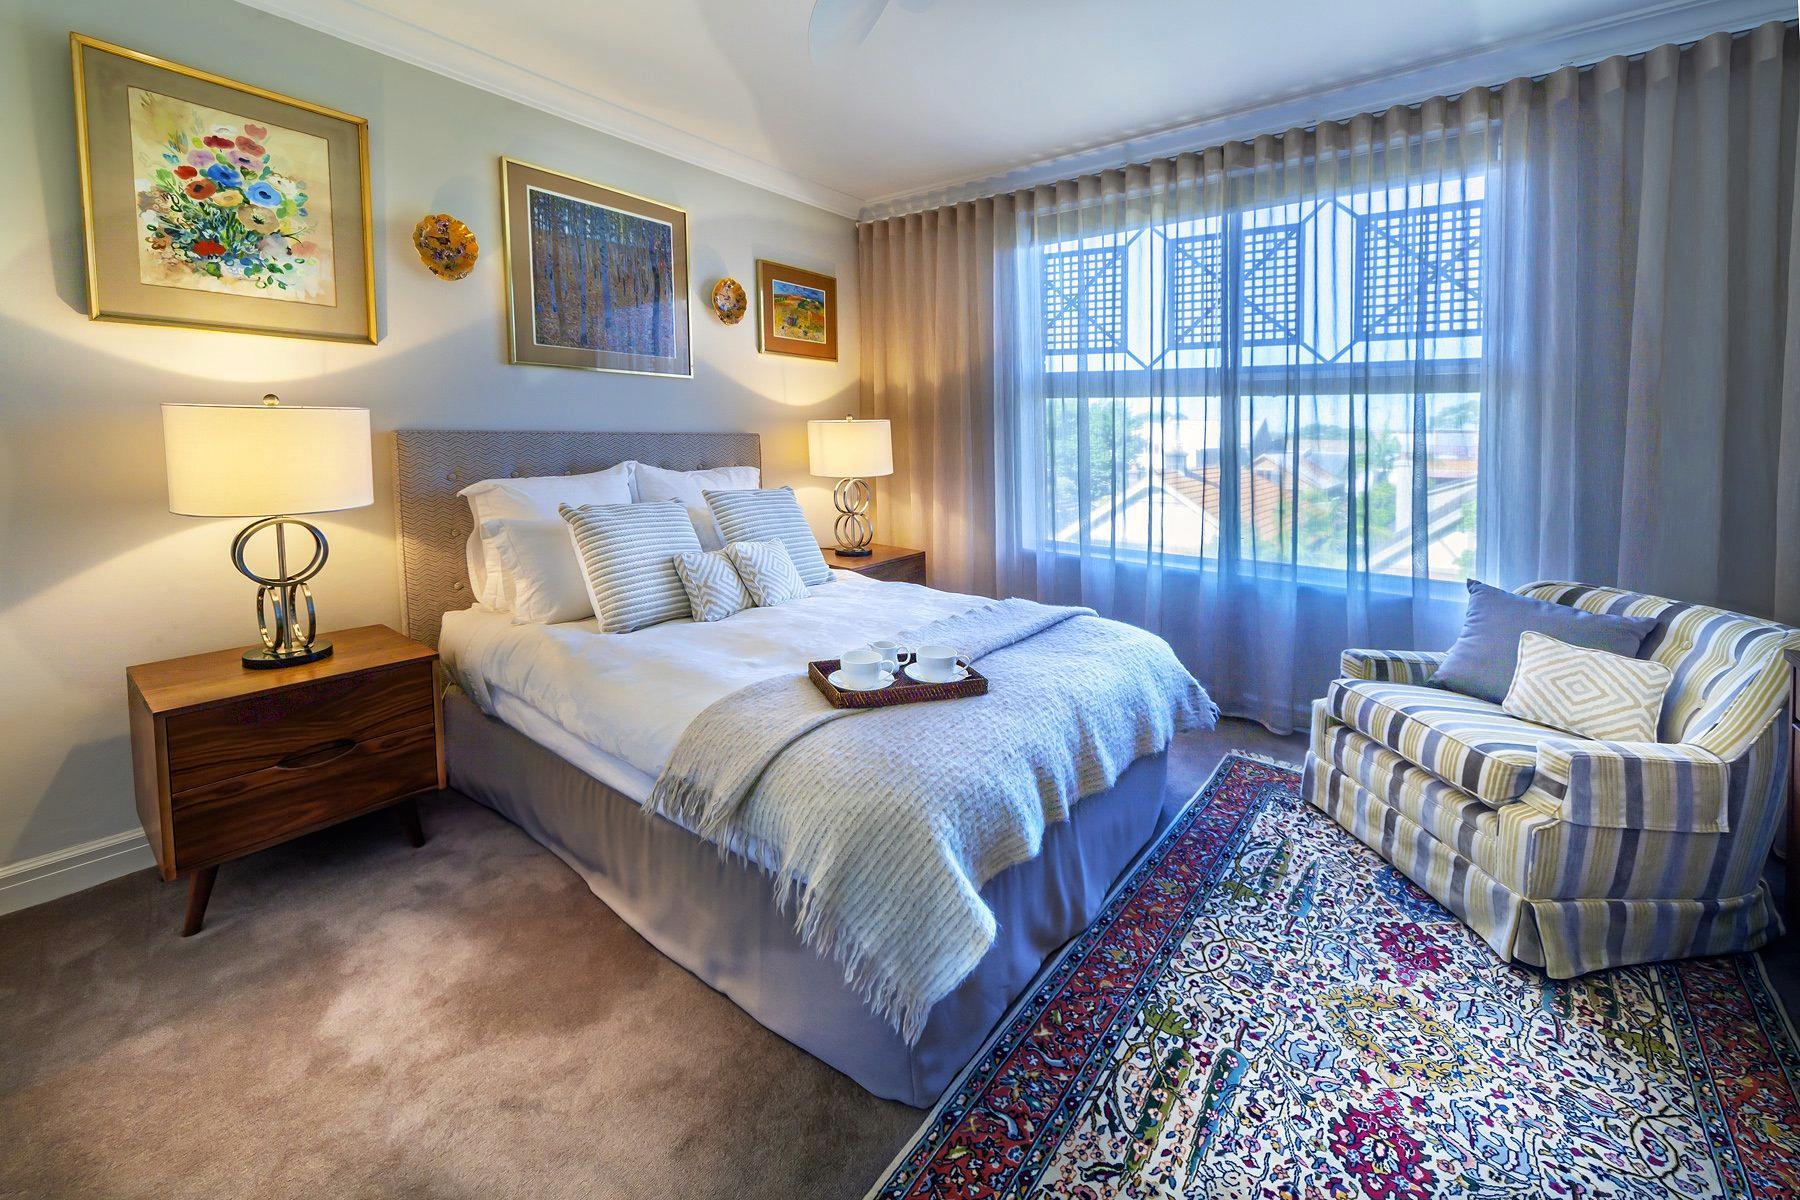 Residential in Mosman Master Bedroom by Meli Studio.